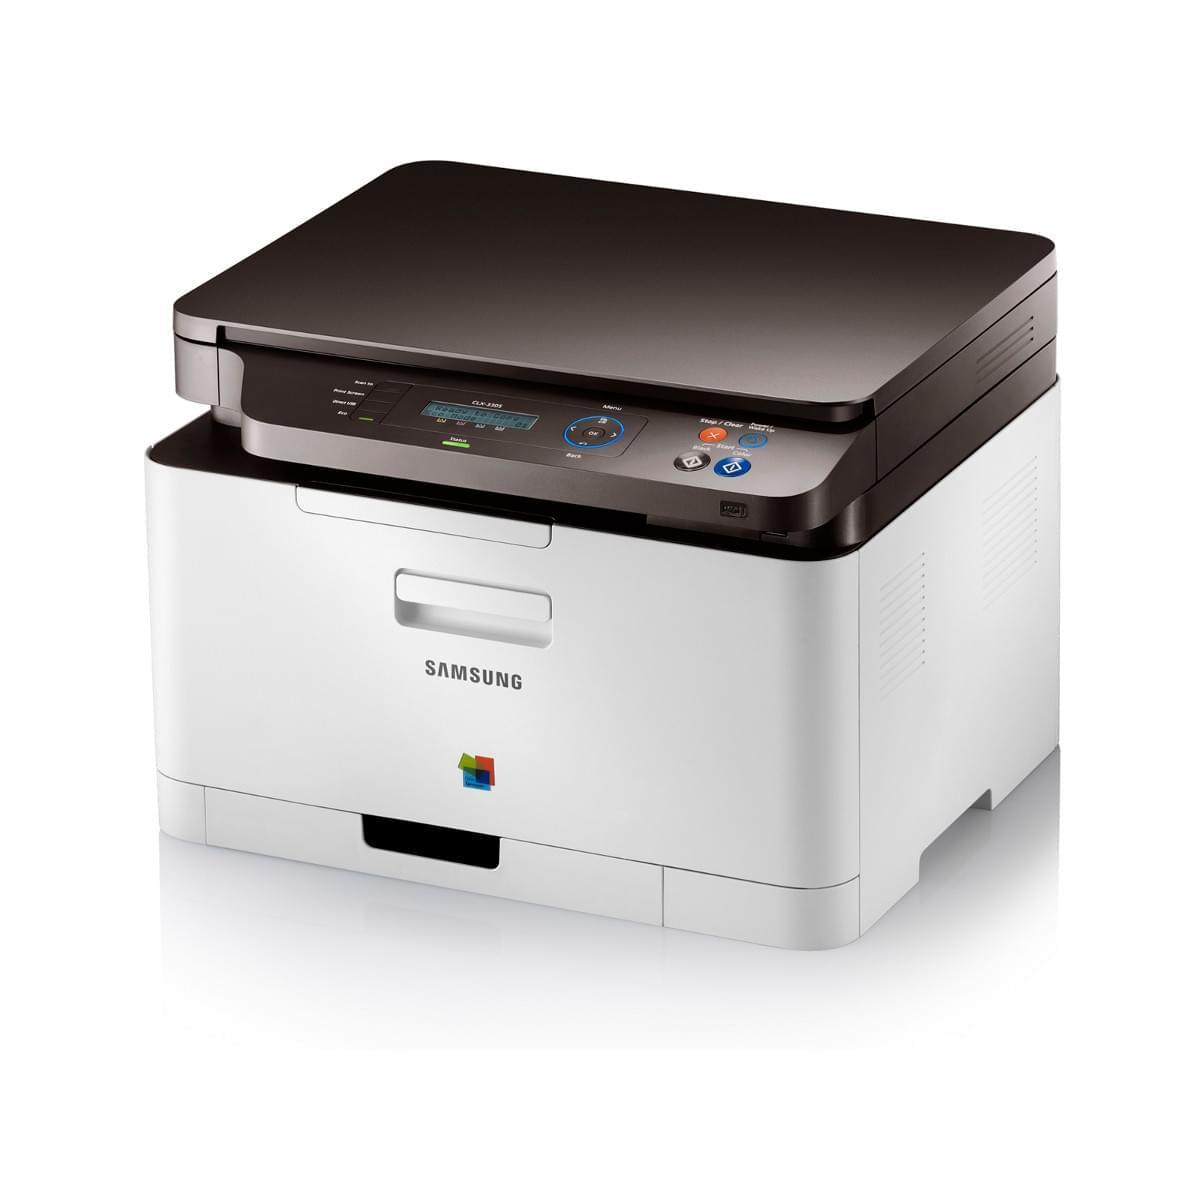 Imprimante multifonction Samsung CLX-3305W - Cybertek.fr - 0